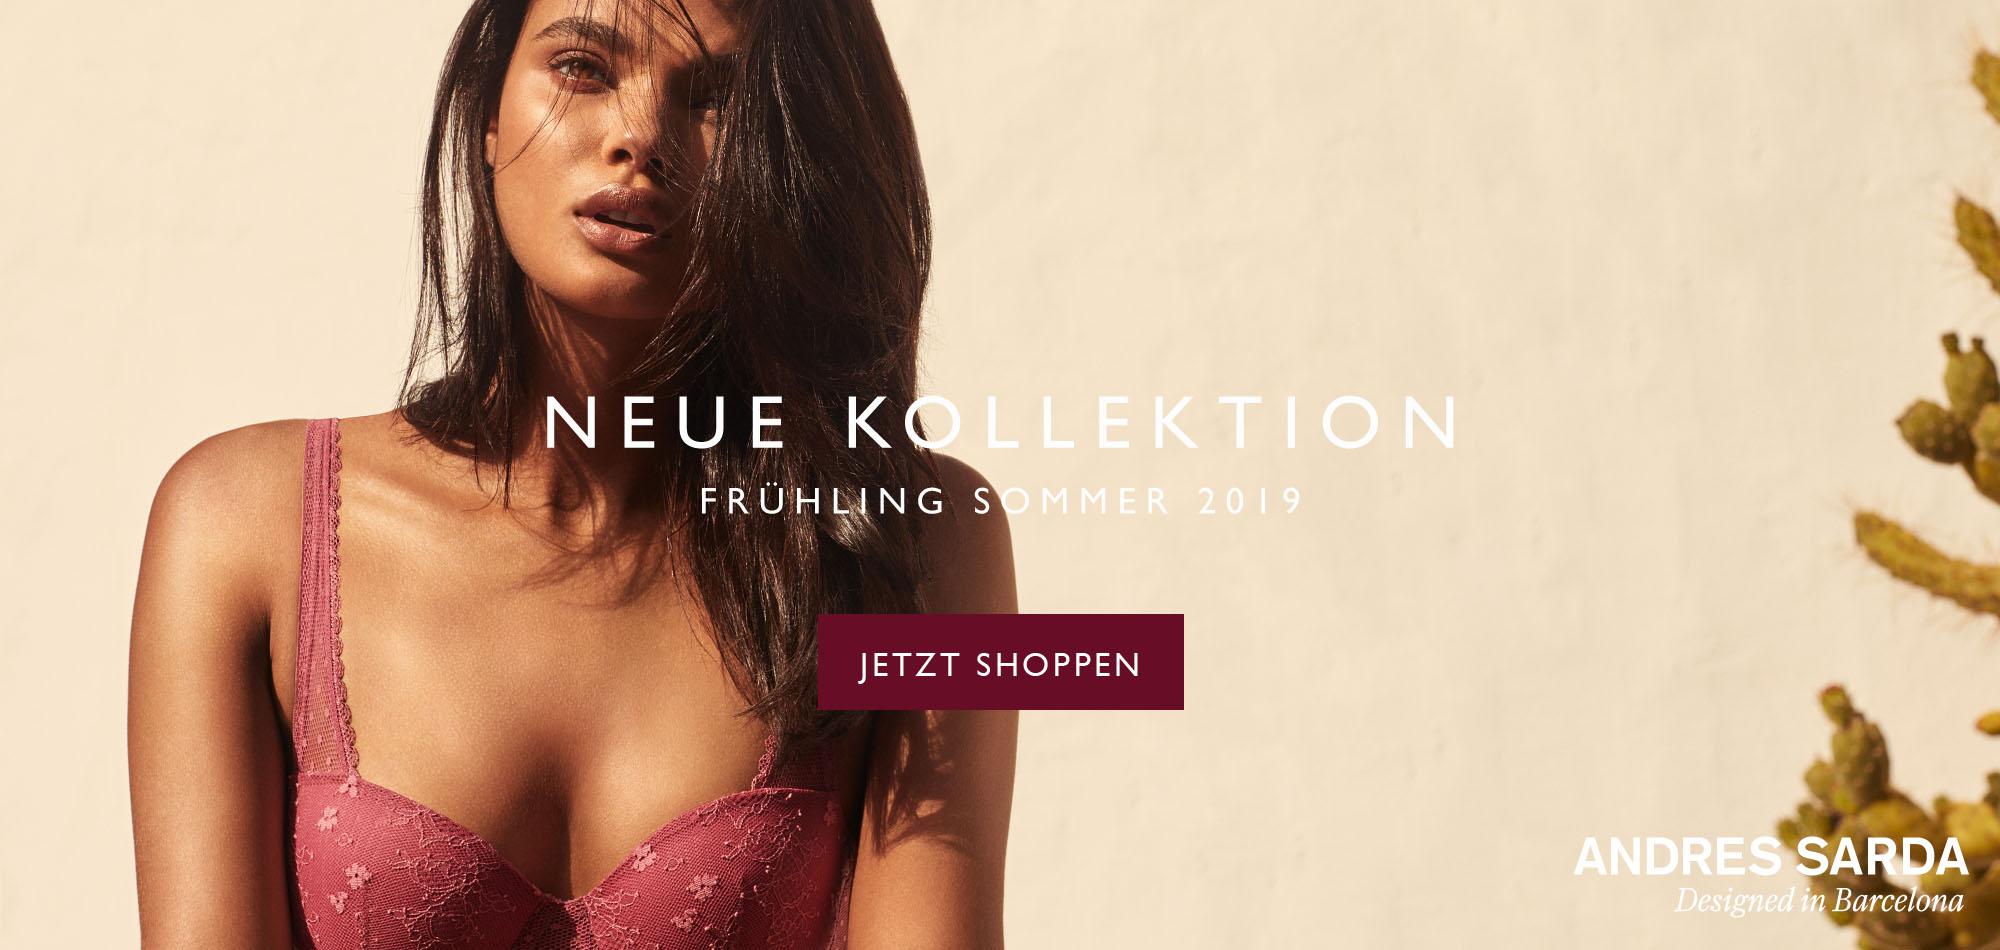 Neue Kollektion Frühling Sommer 2019